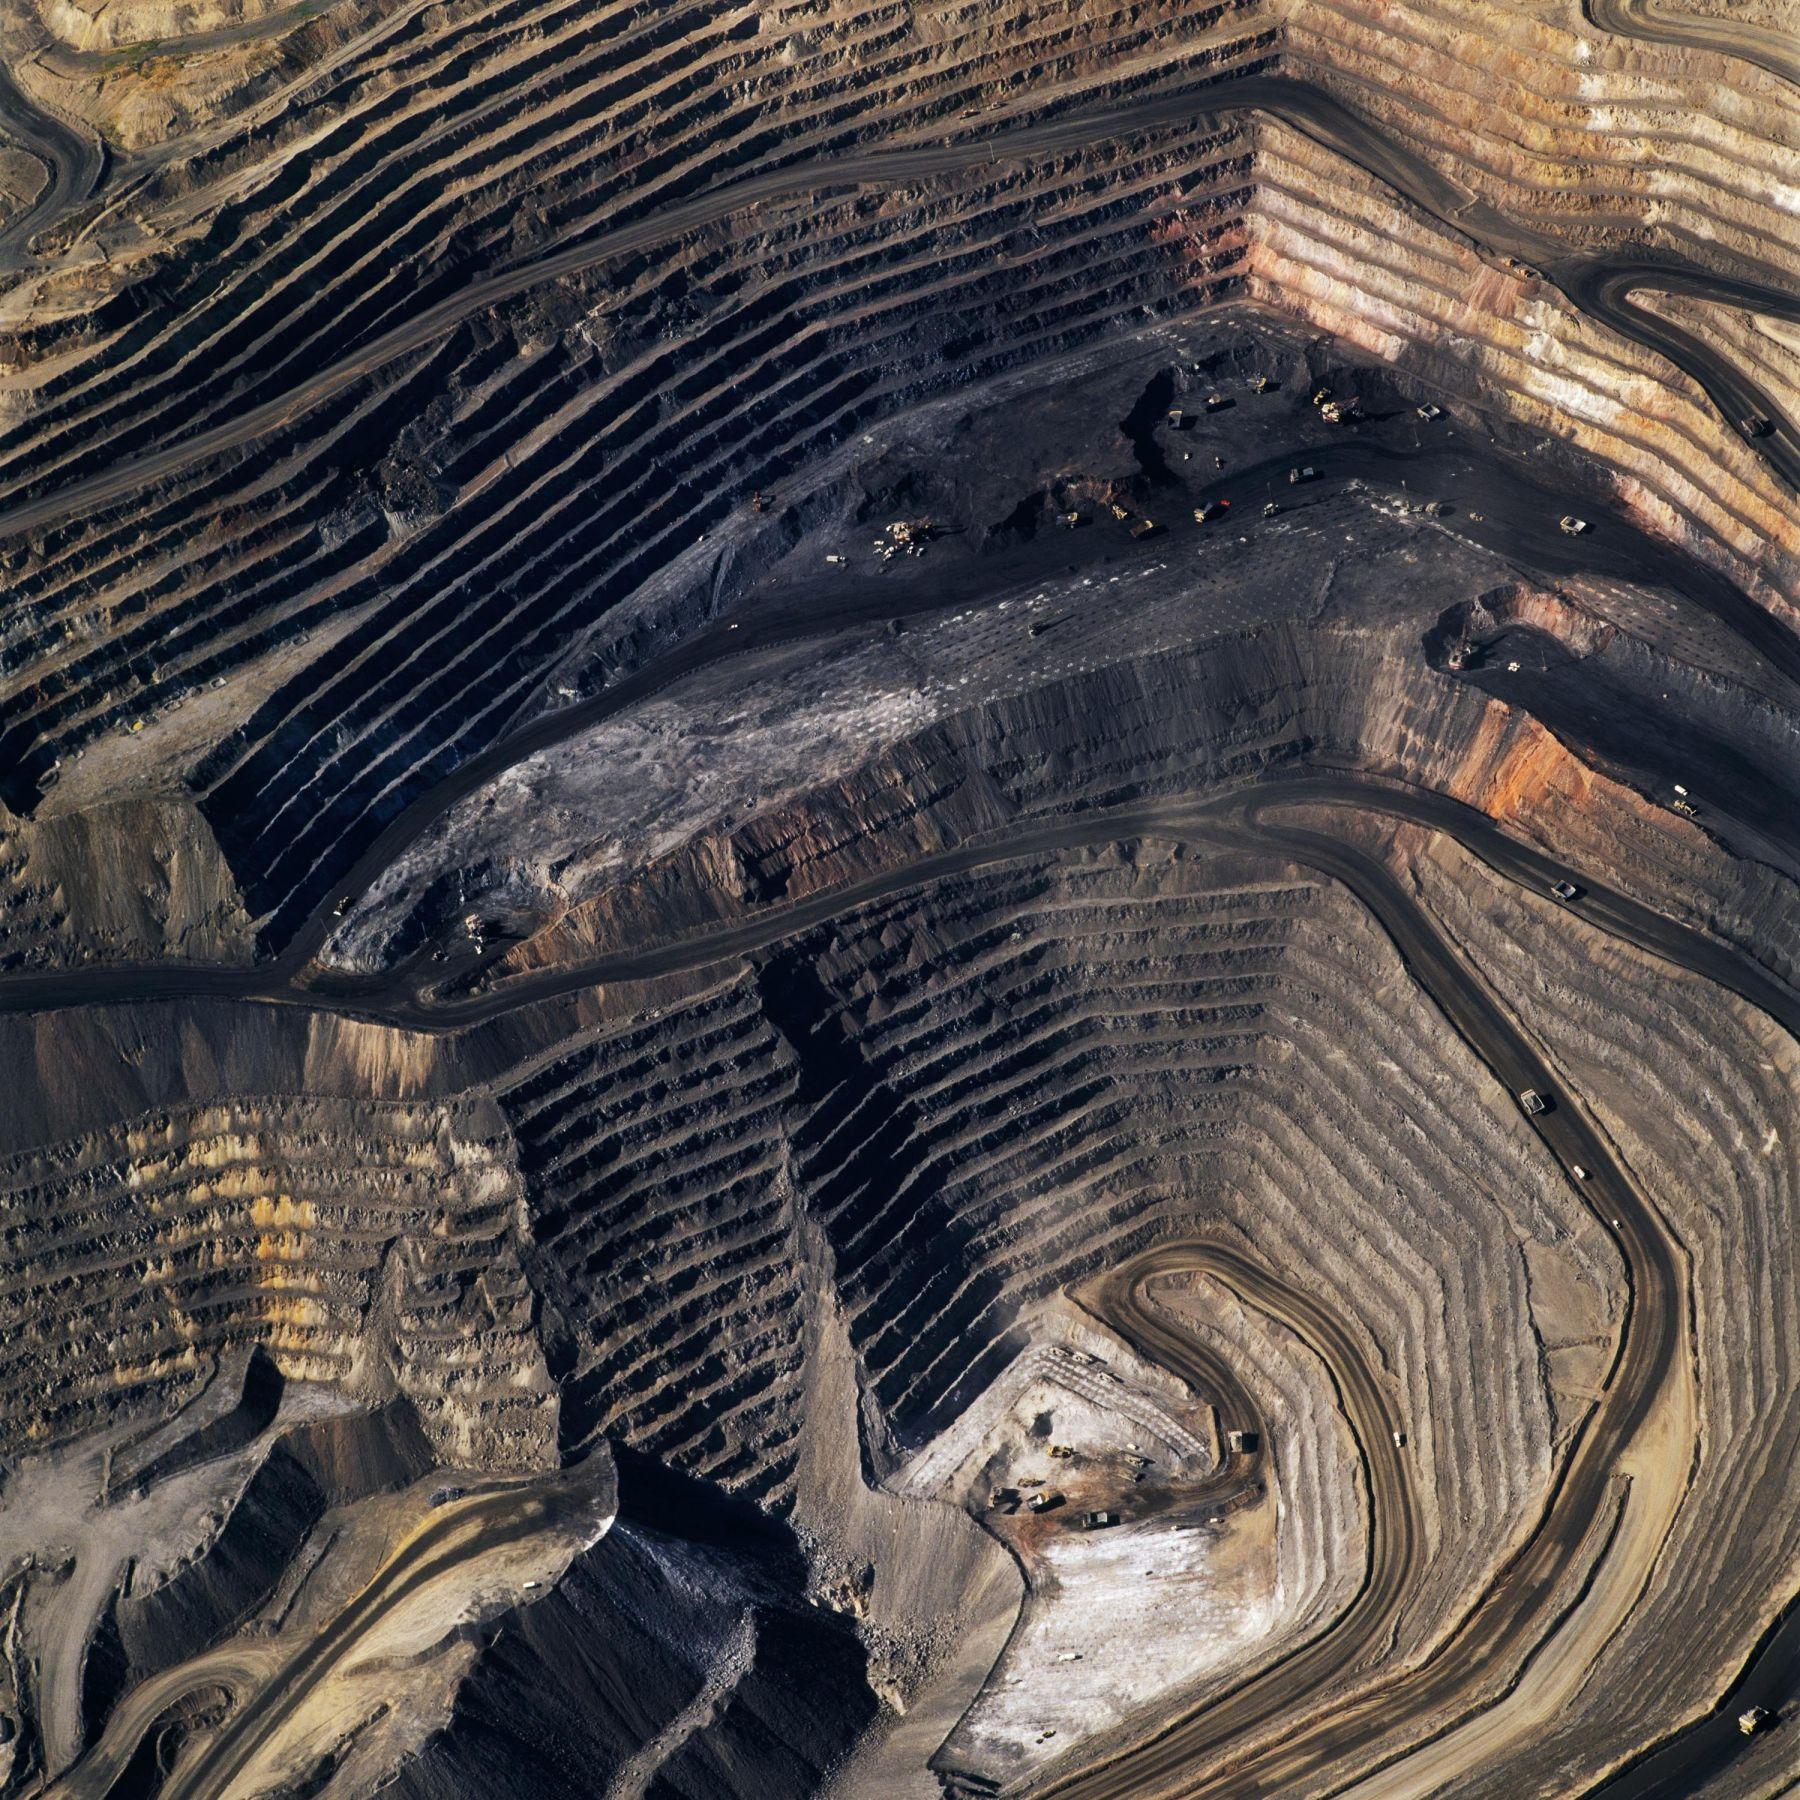 David Maisel, American Mine (Carlin, NV 2), 2007